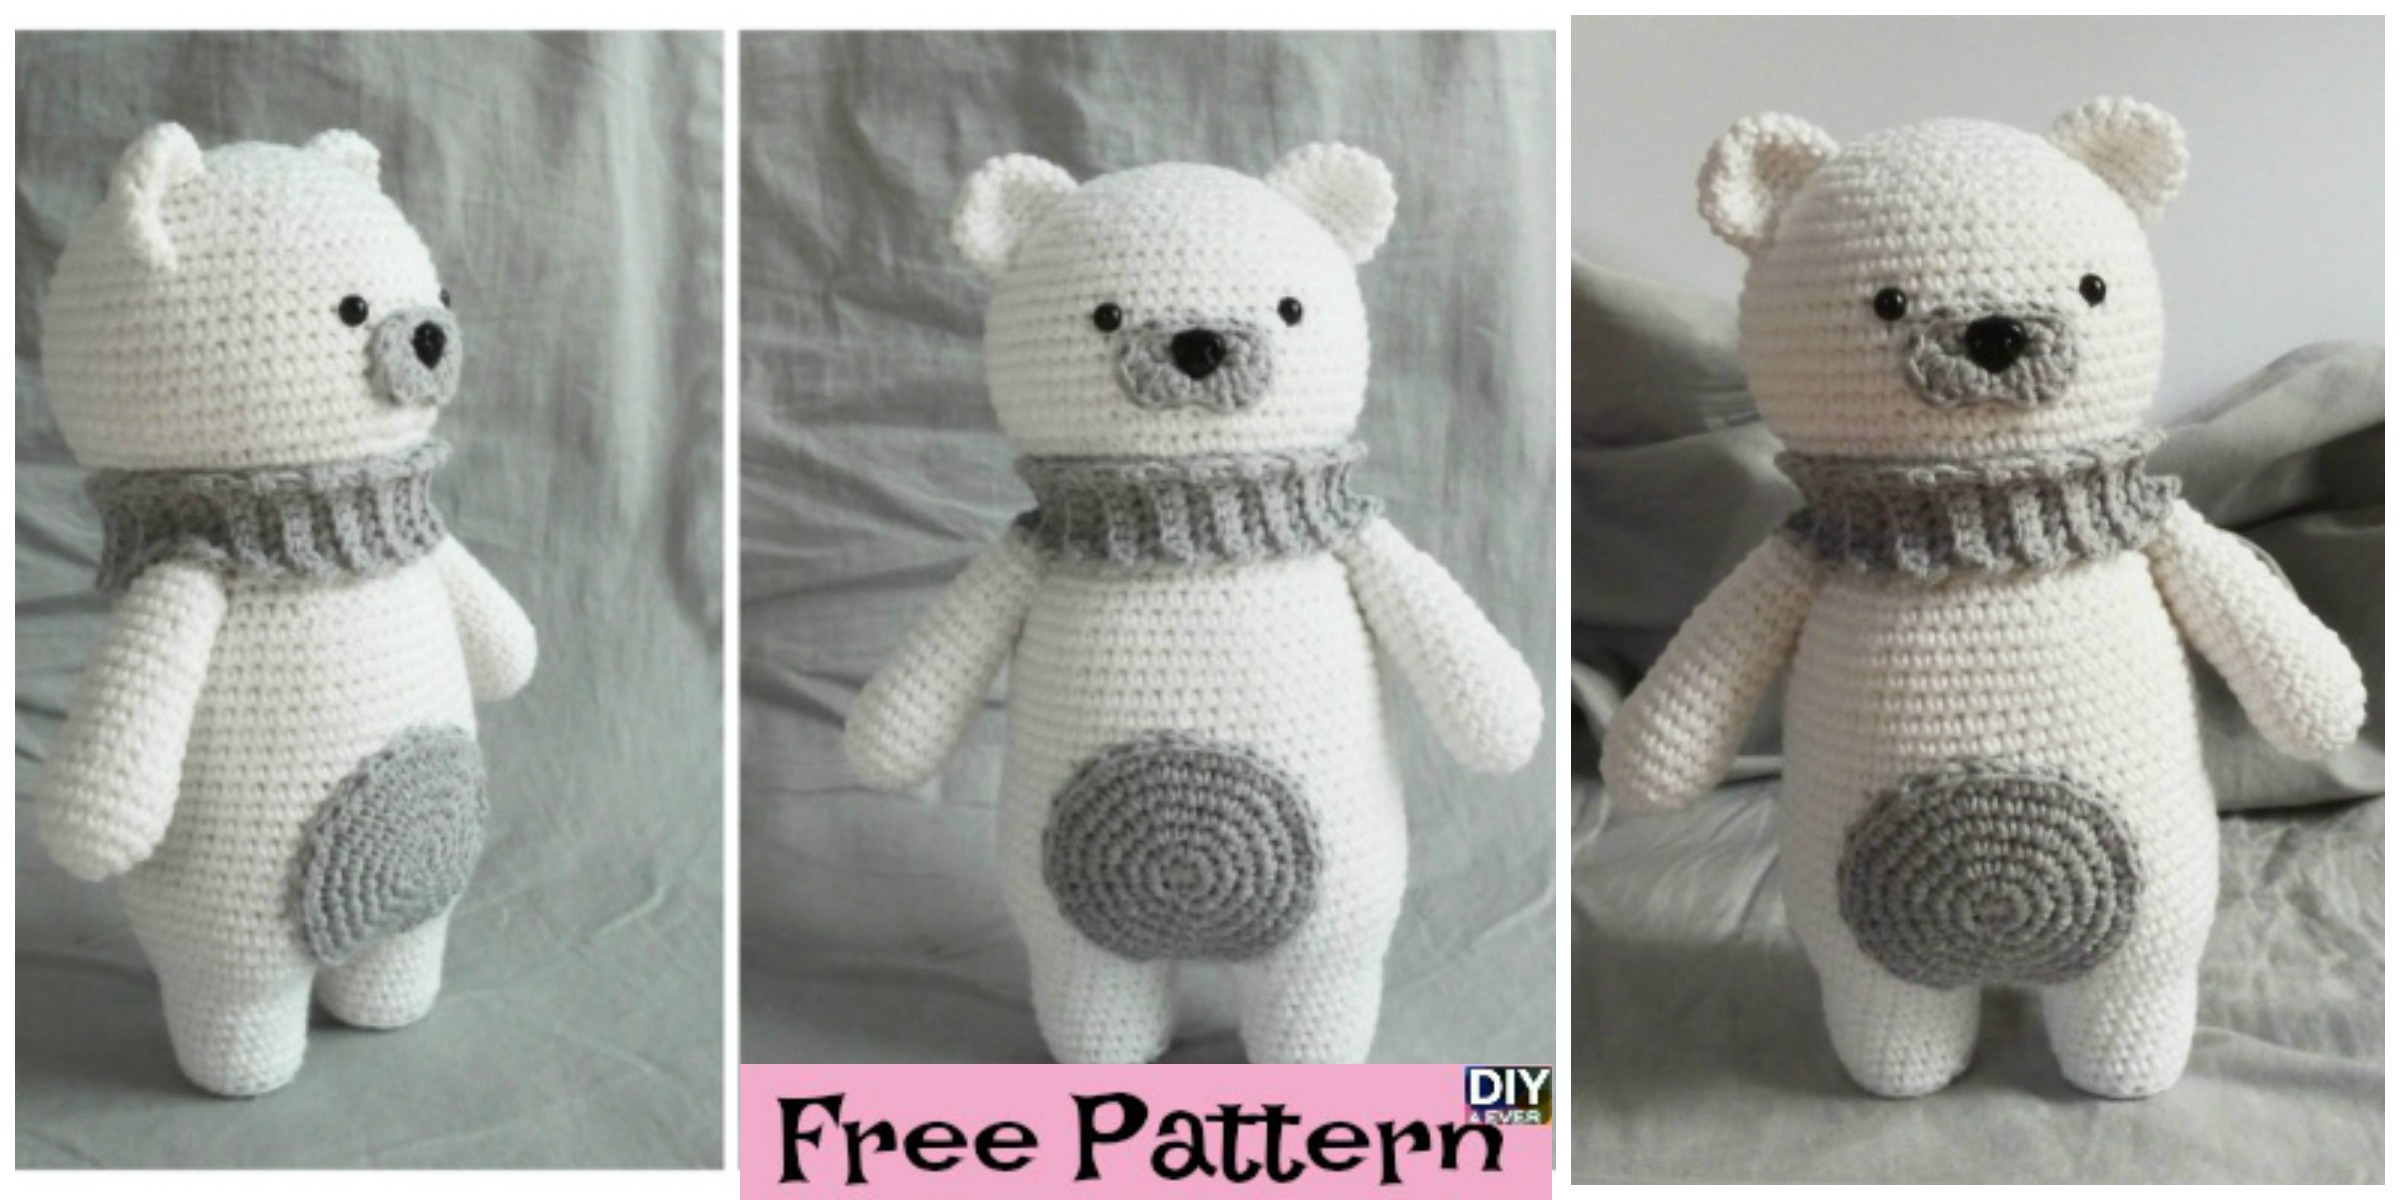 Crochet Polar Bear Amigurumi - Free Pattern - DIY 4 EVER